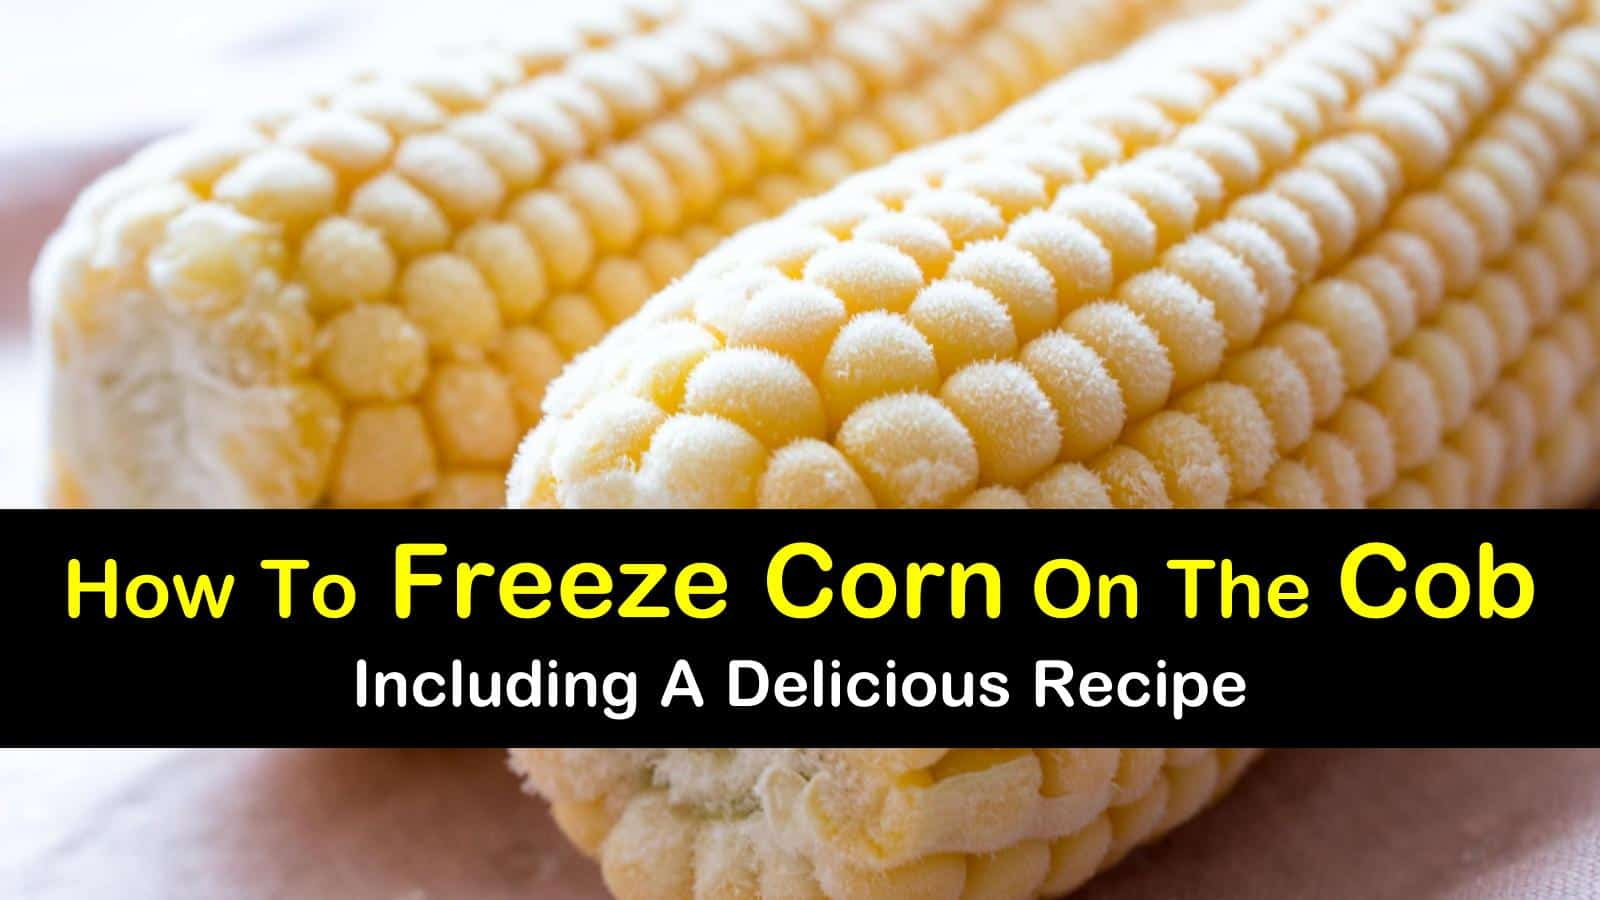 how to freeze corn on the cob titleimg1